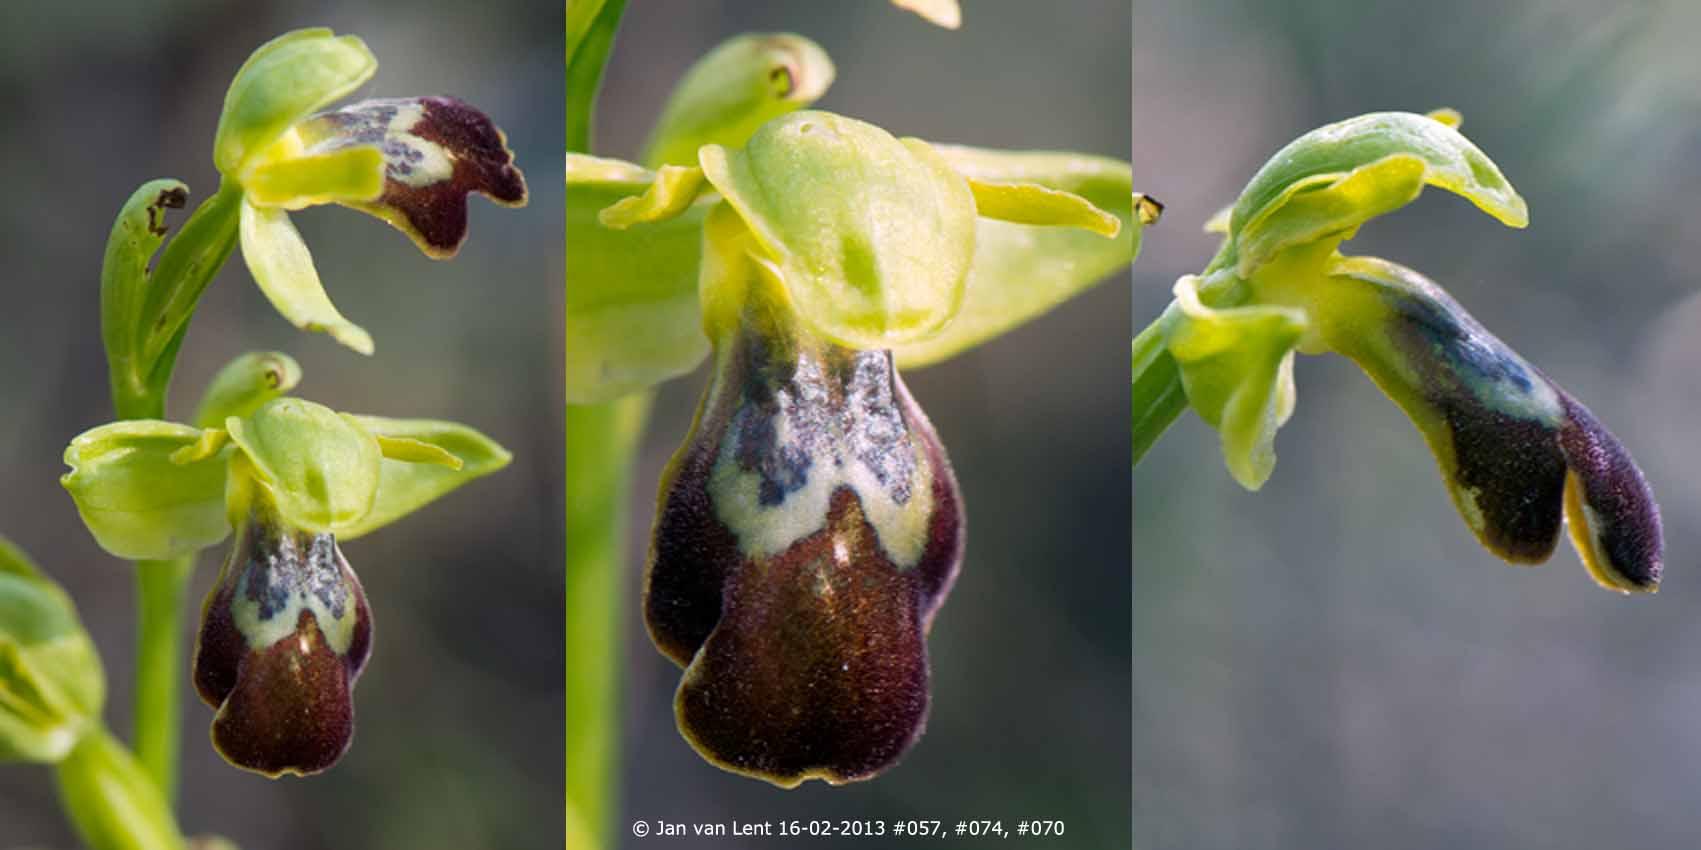 Ophrys sancti-isidorii at Plakés, © JvL 16-02-2013 #057, #074, #070